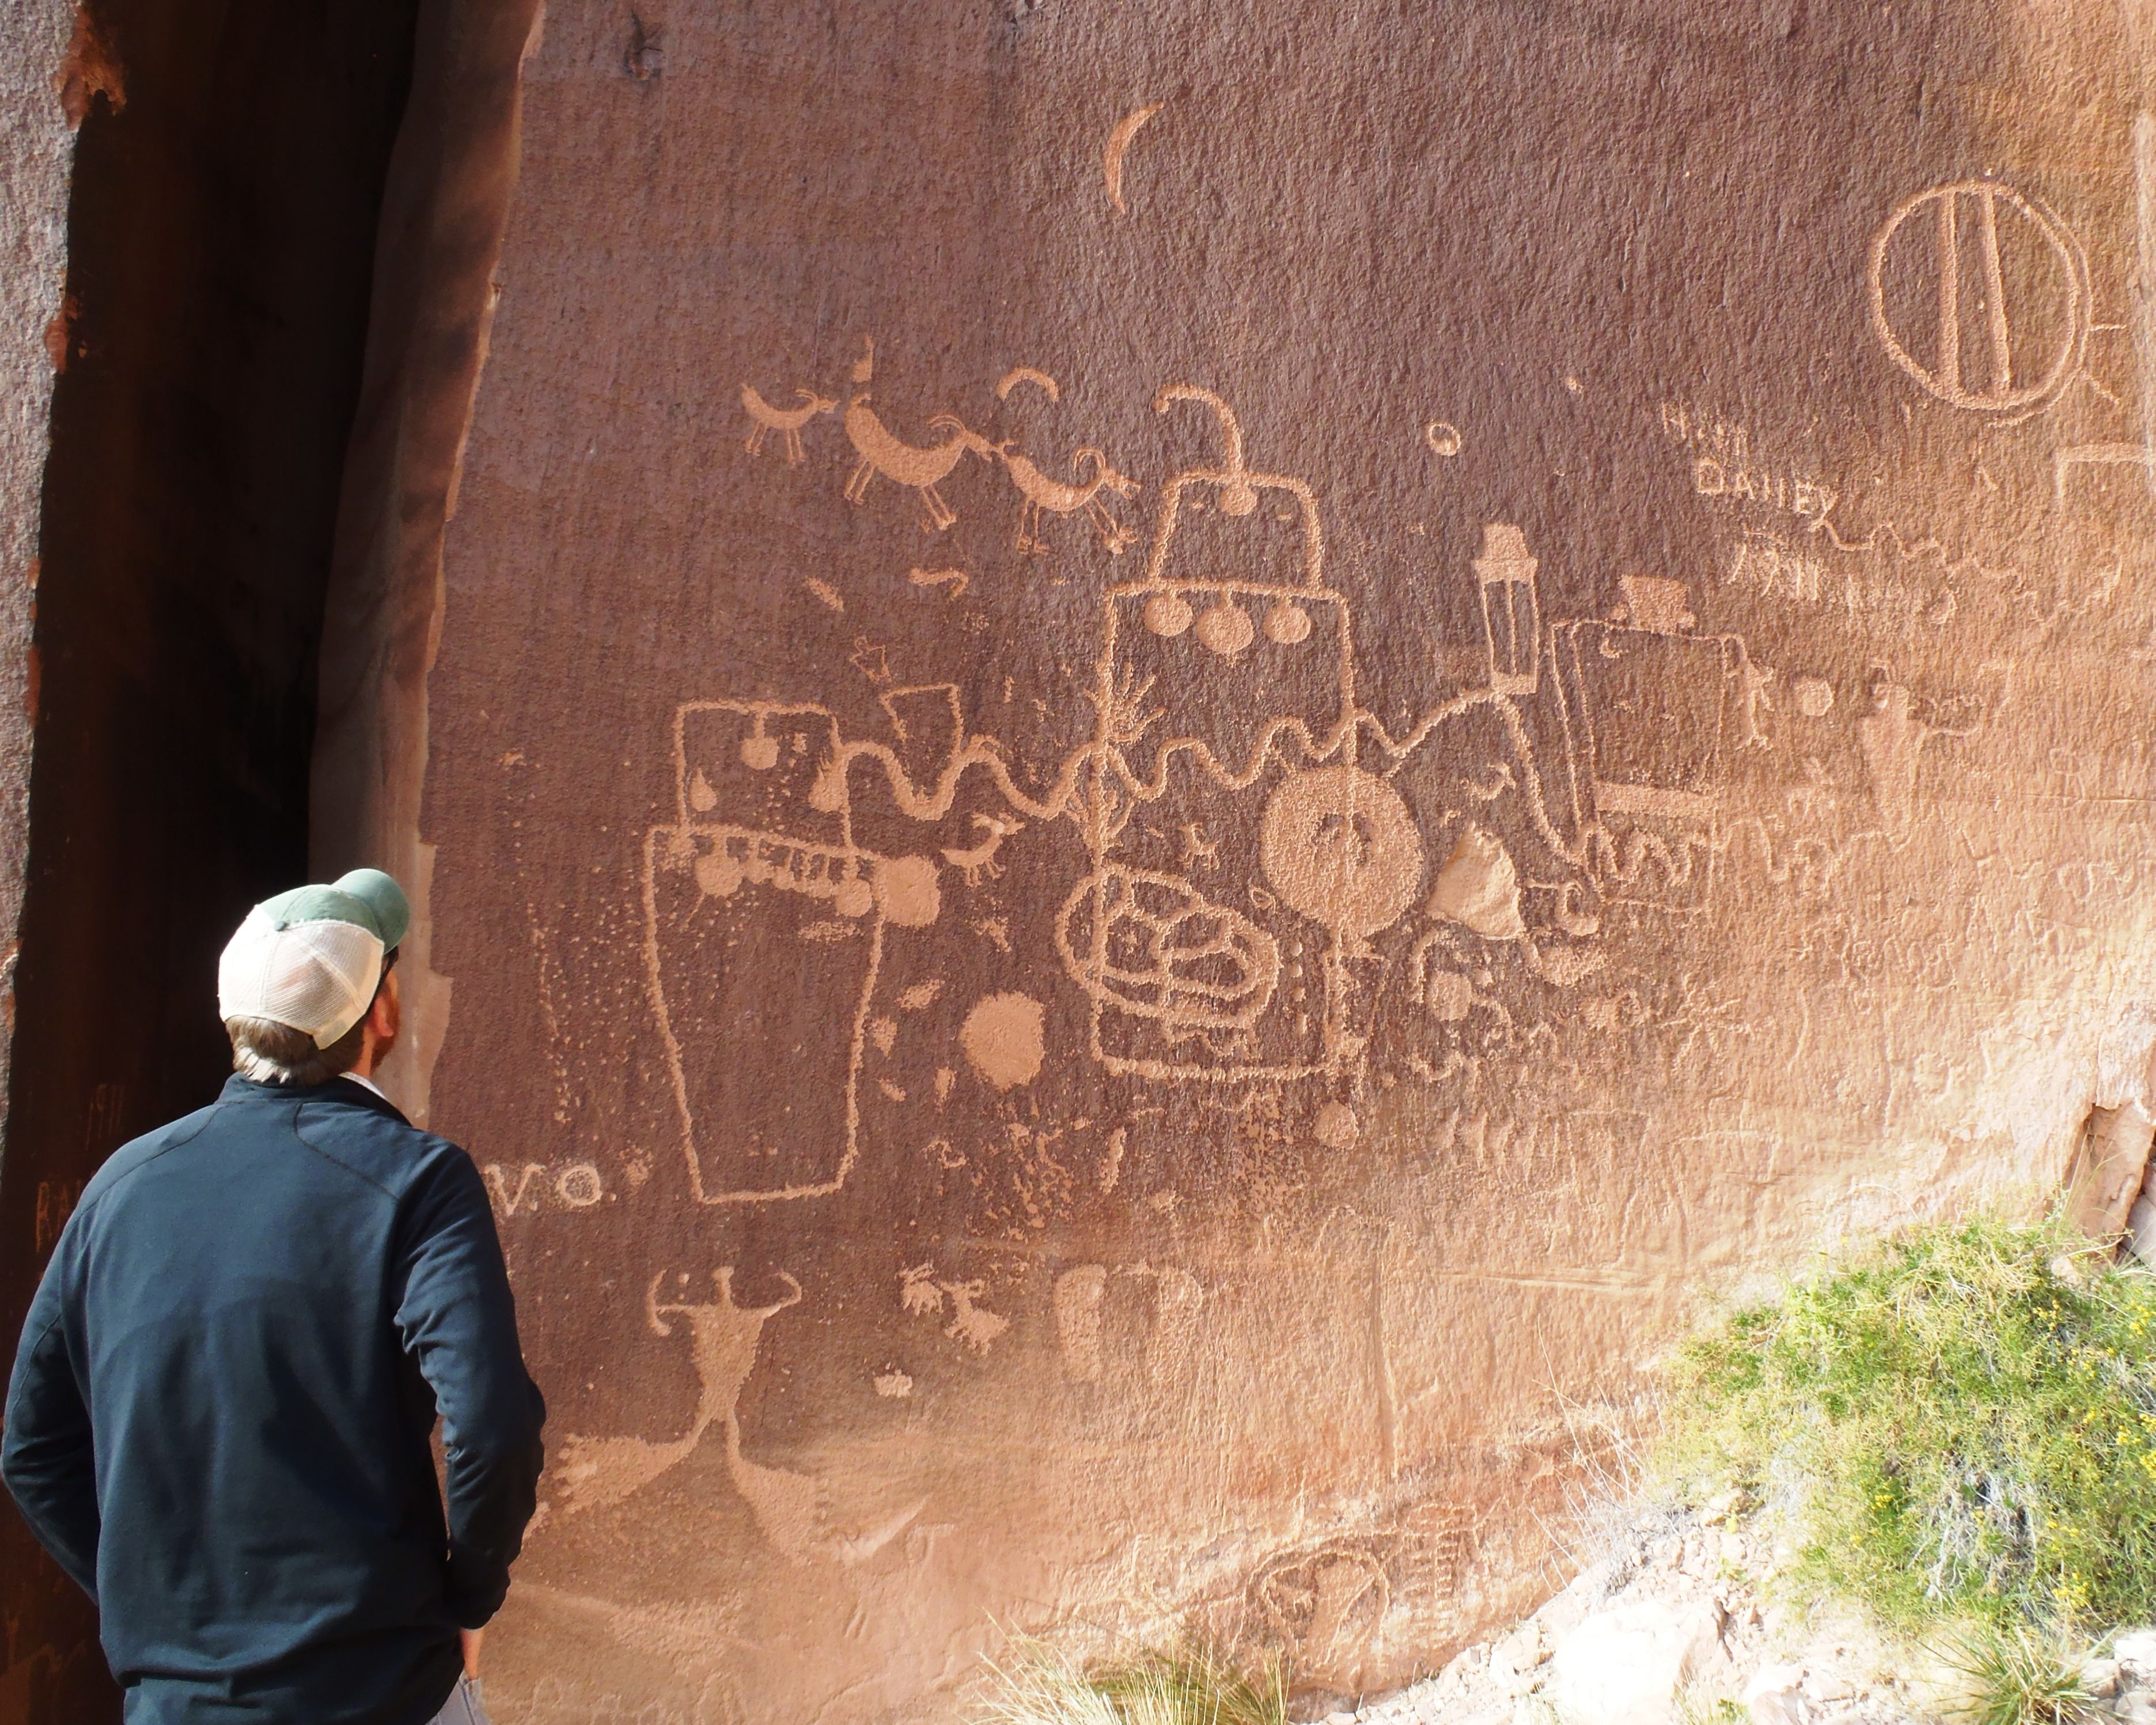 Indian creek petroglyphs san juan county ut rock art